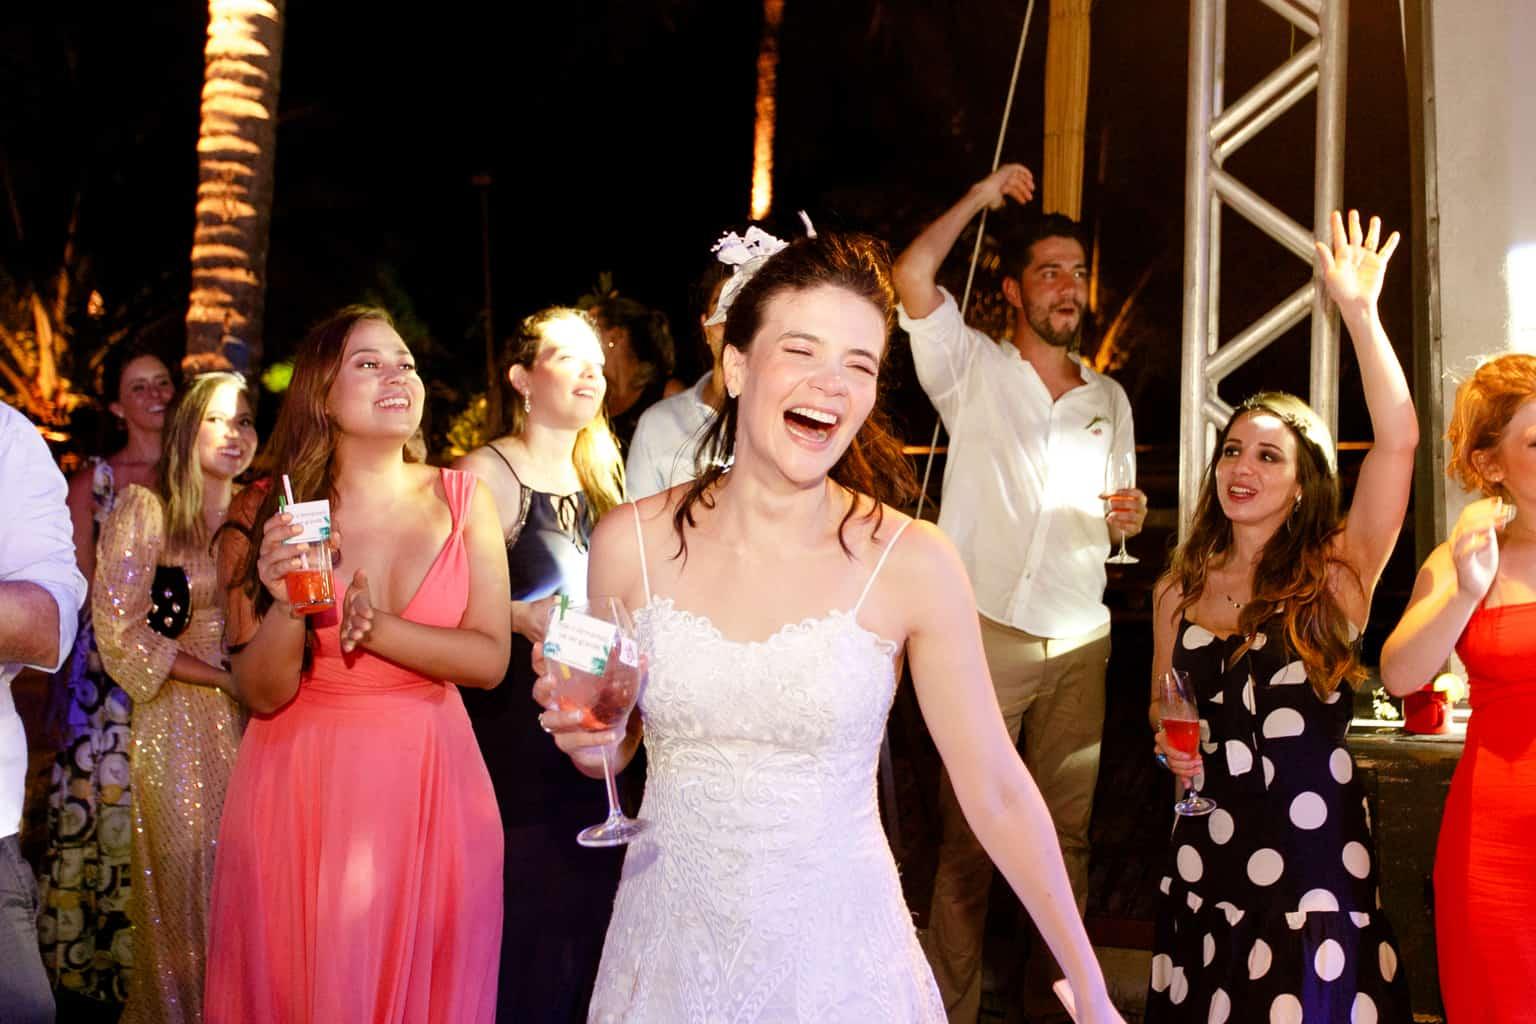 Casamento-Emanuelle-e-Alysson-Fotografia-Tadeu-Nanó-e-Luca-Antunes162